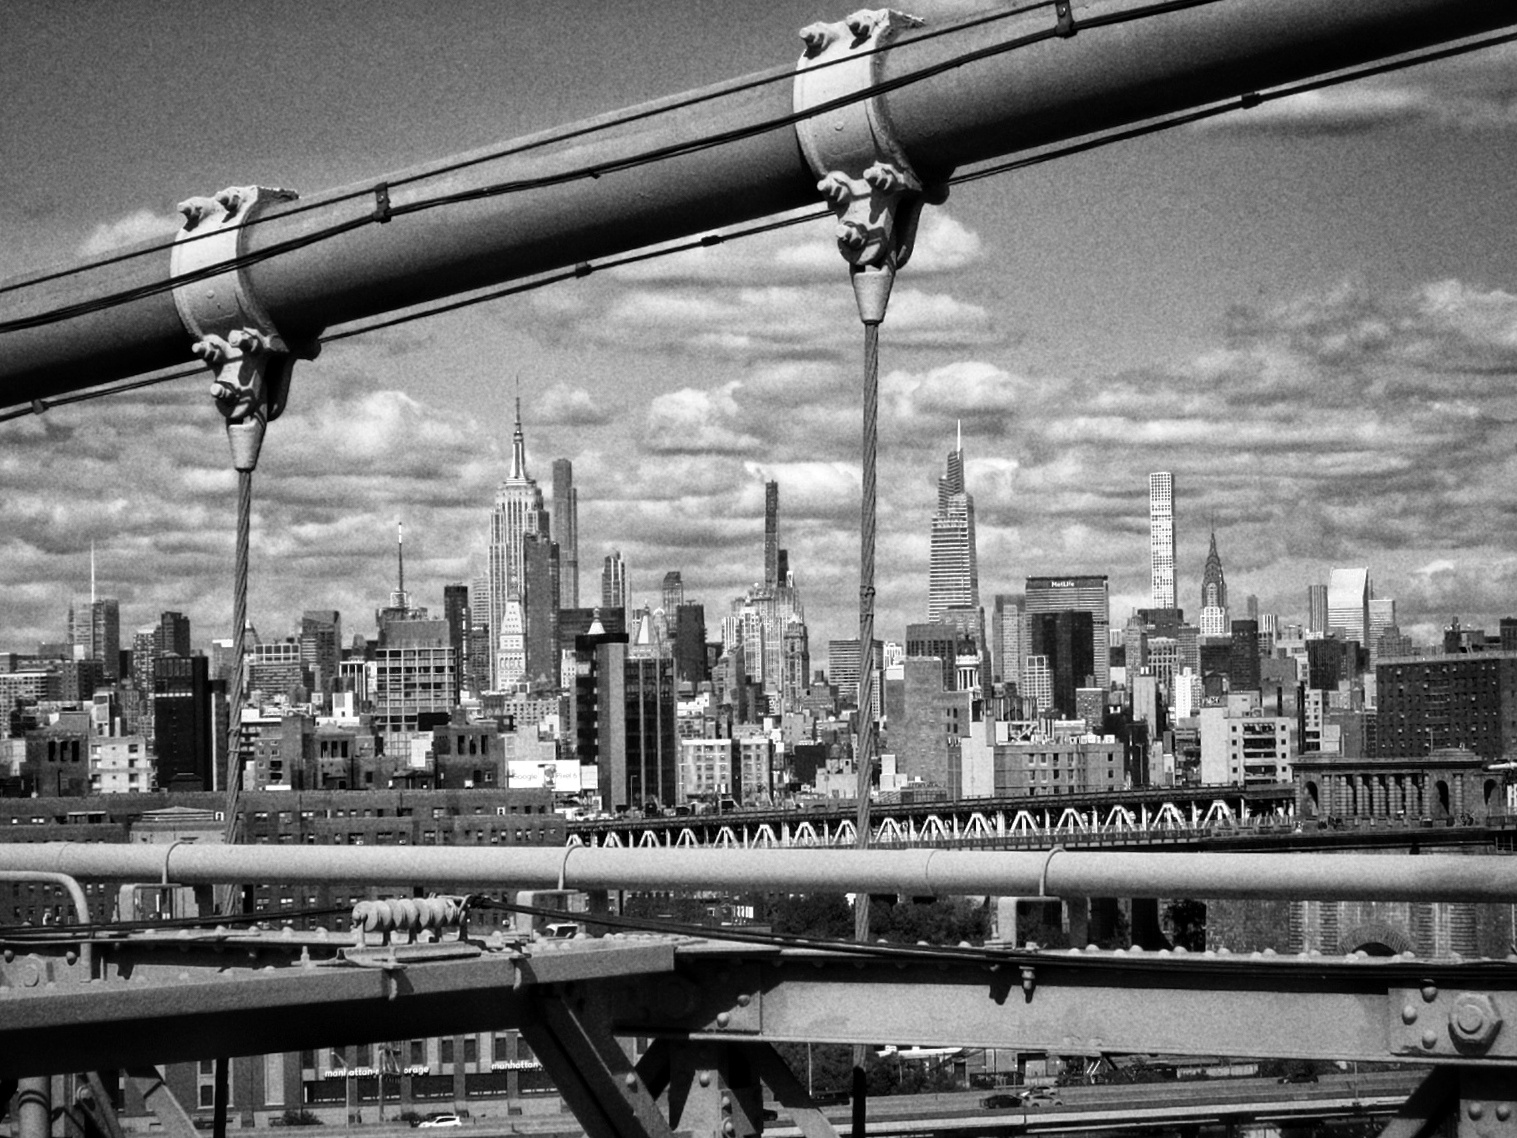 Guida di New York, Panorama di Manhattan visto dal Ponte di Brooklyn